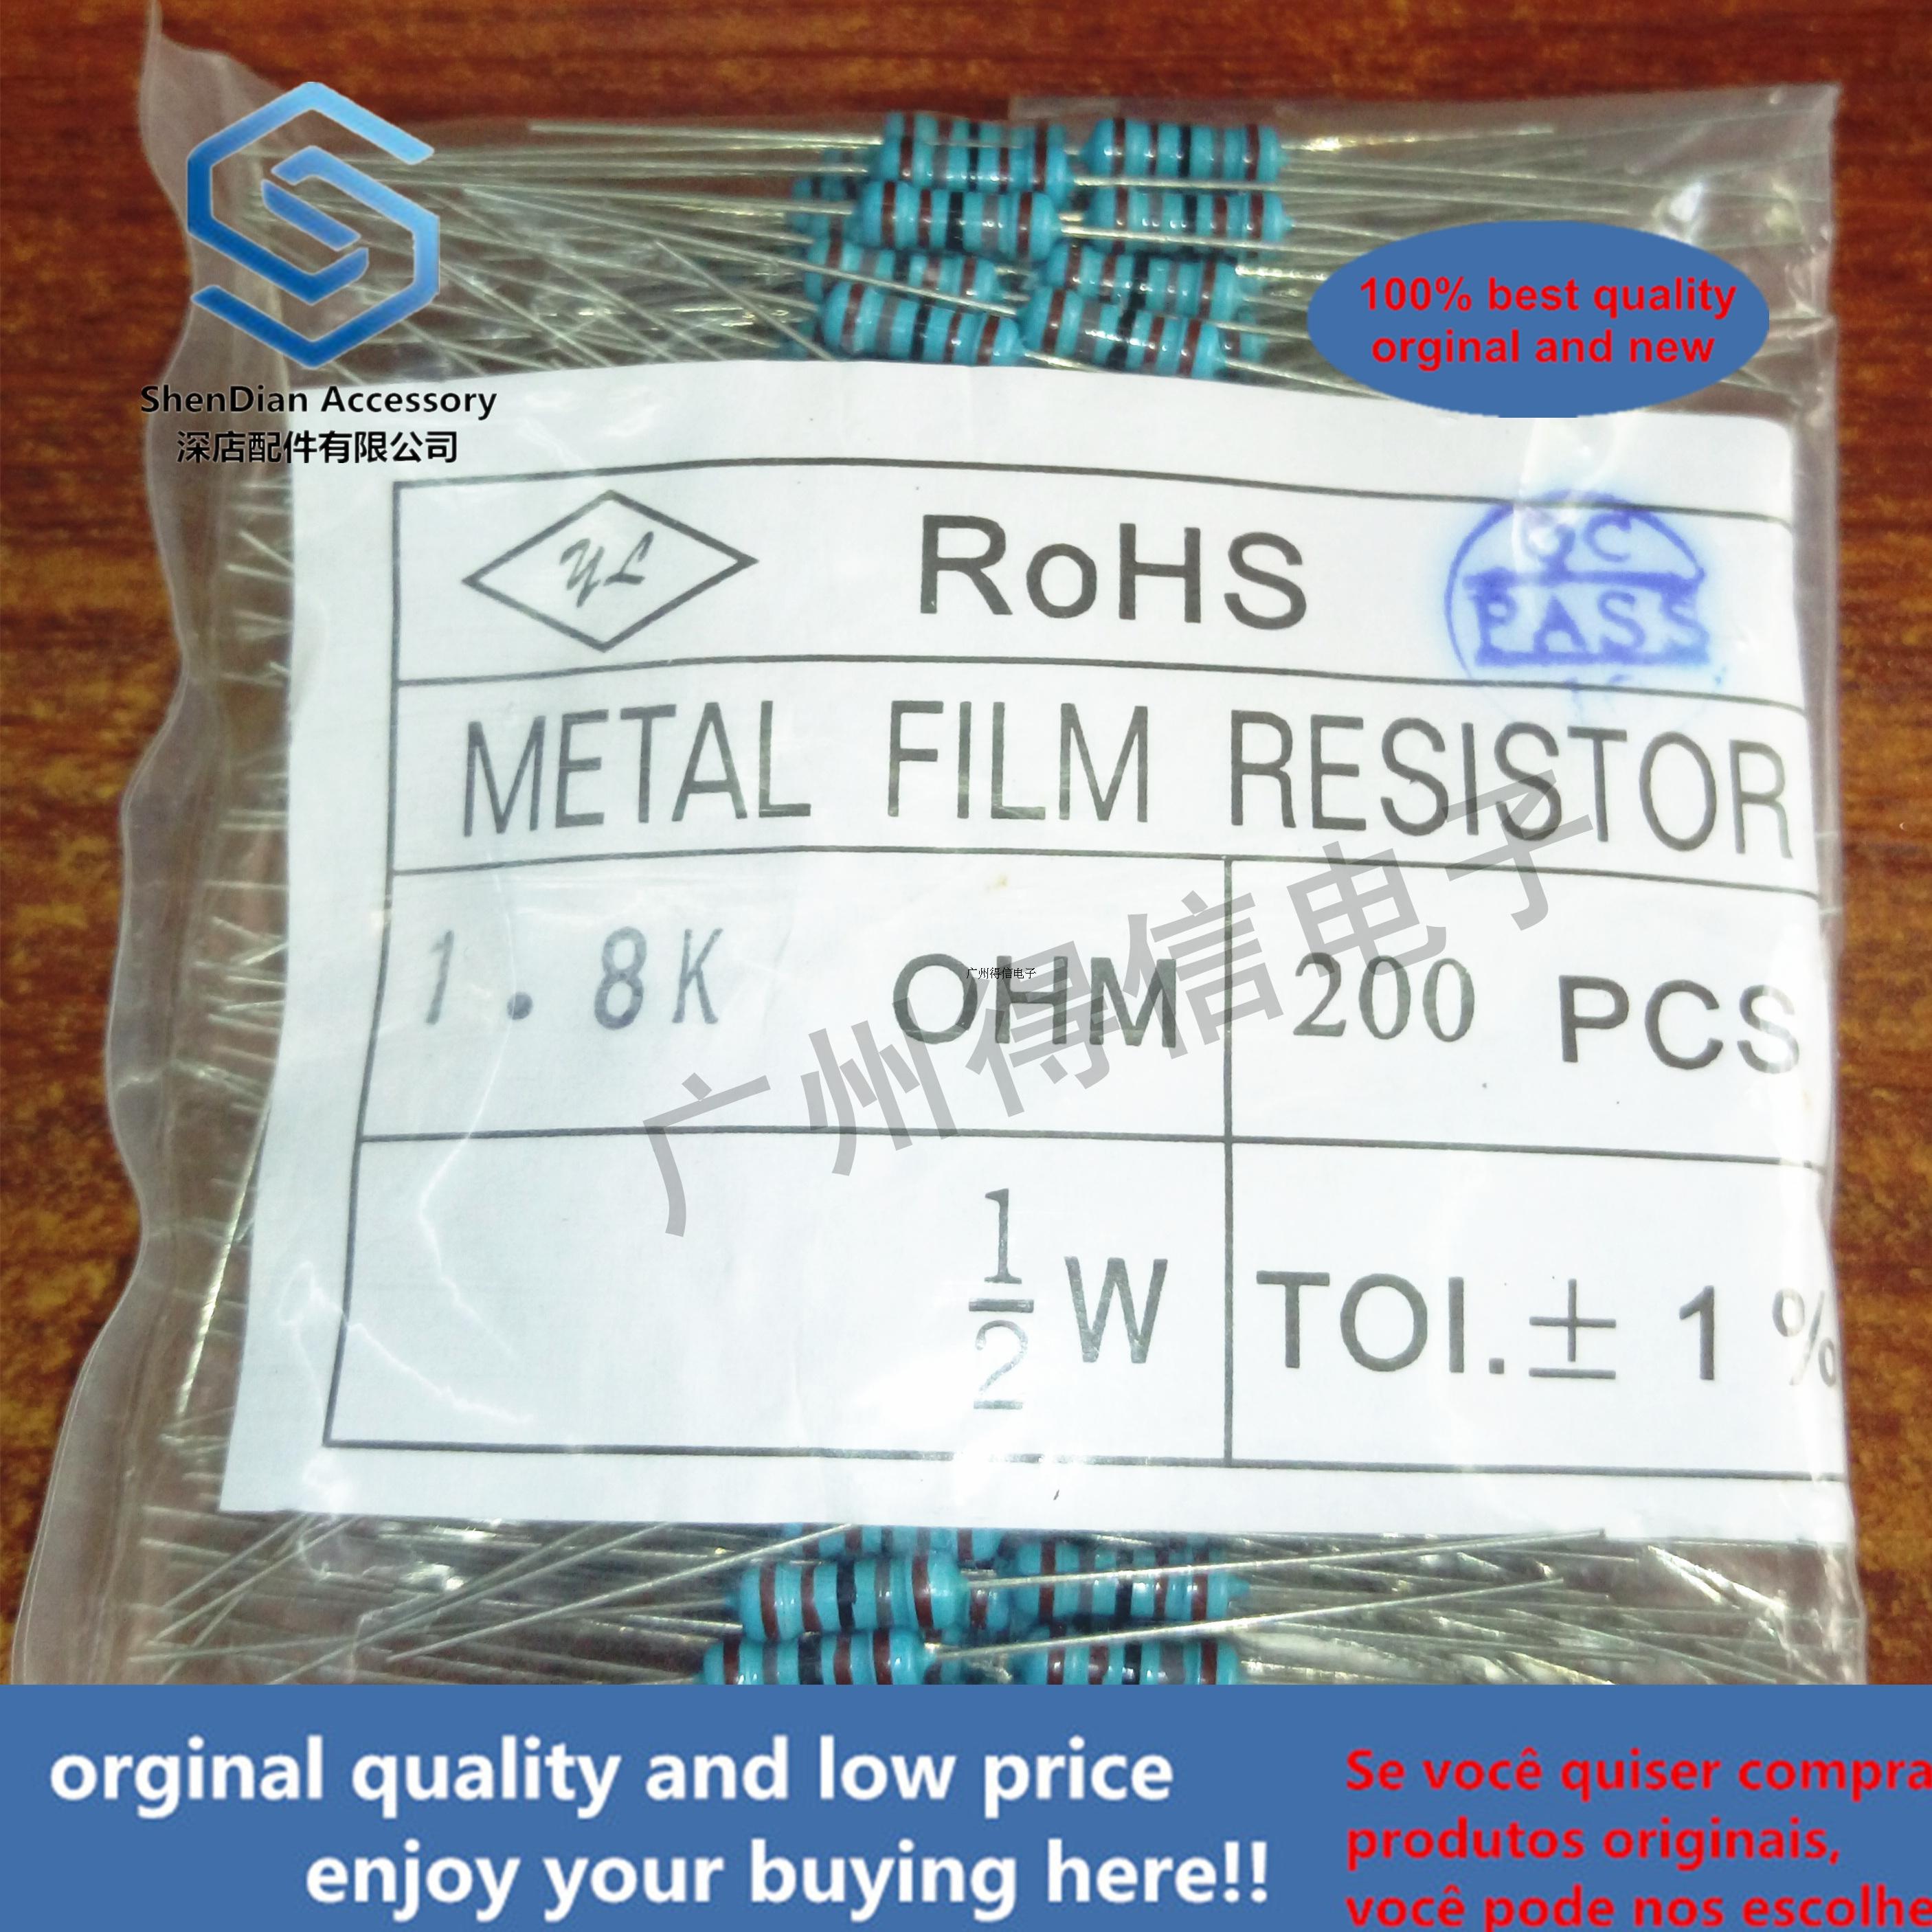 200pcs 1 / 2W 160K 1% Brand New Metal Film Iron Feet Resistor Bag 200 Pcs Per Pack